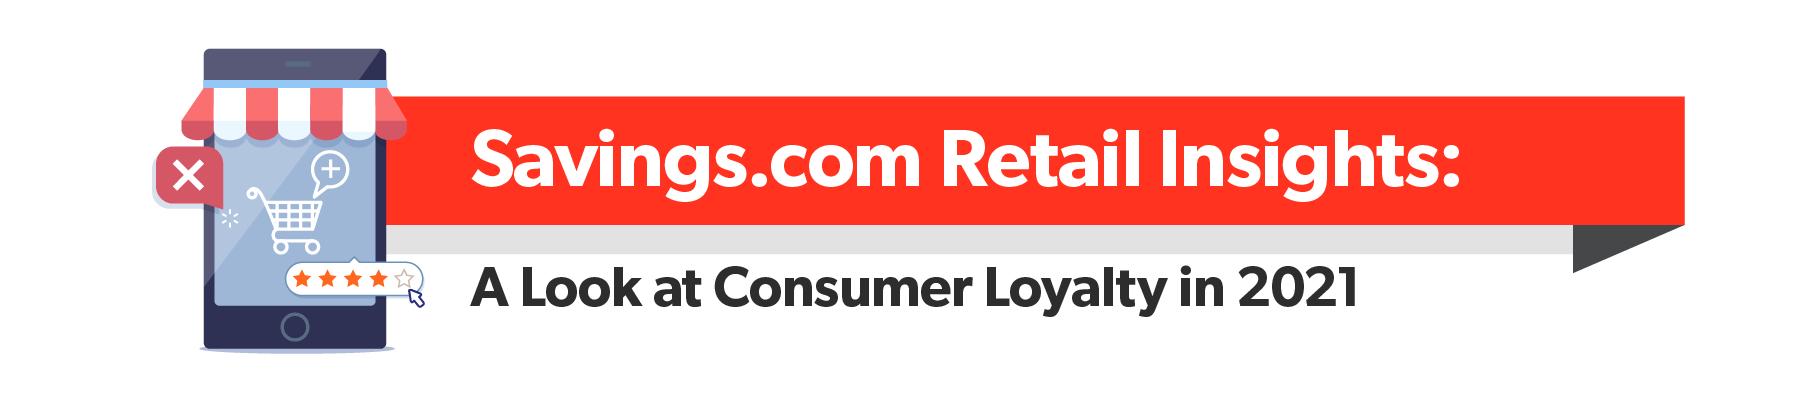 Savings.com Retail Insights: A Look at Consumer Loyalty in 2021